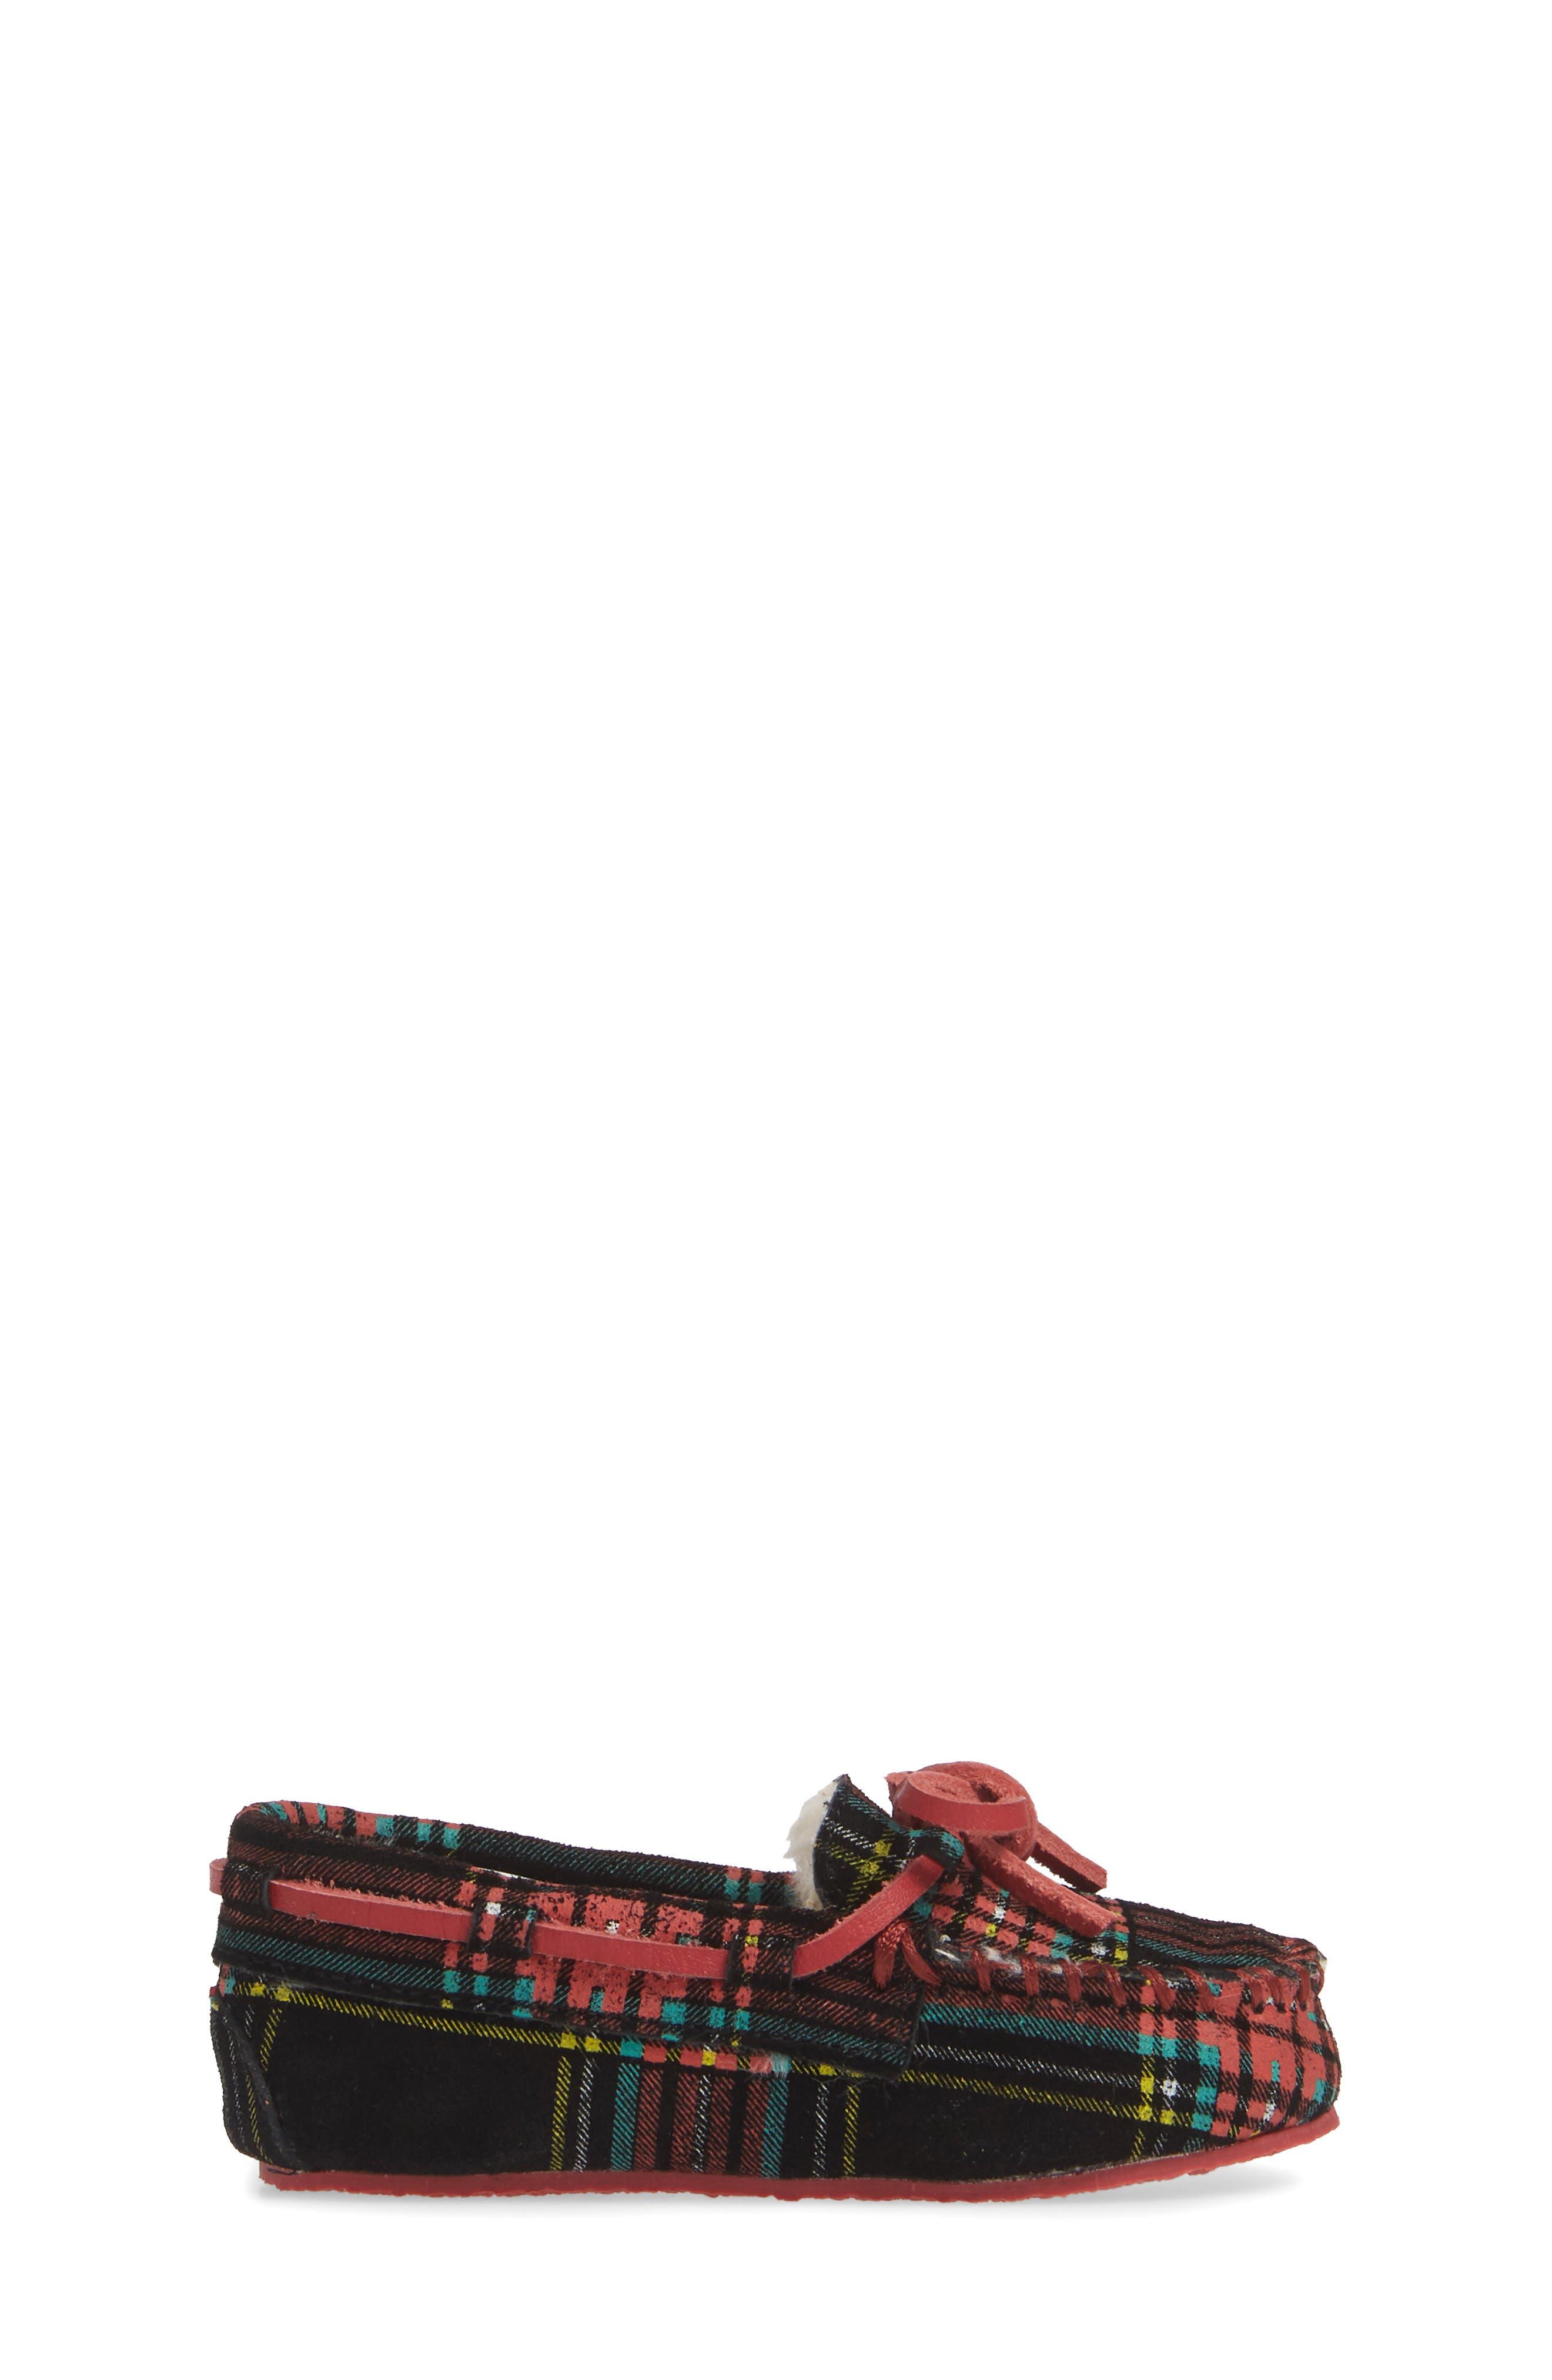 Stewart Black Tartan Moccasin,                             Alternate thumbnail 3, color,                             BLACK RED MULTI